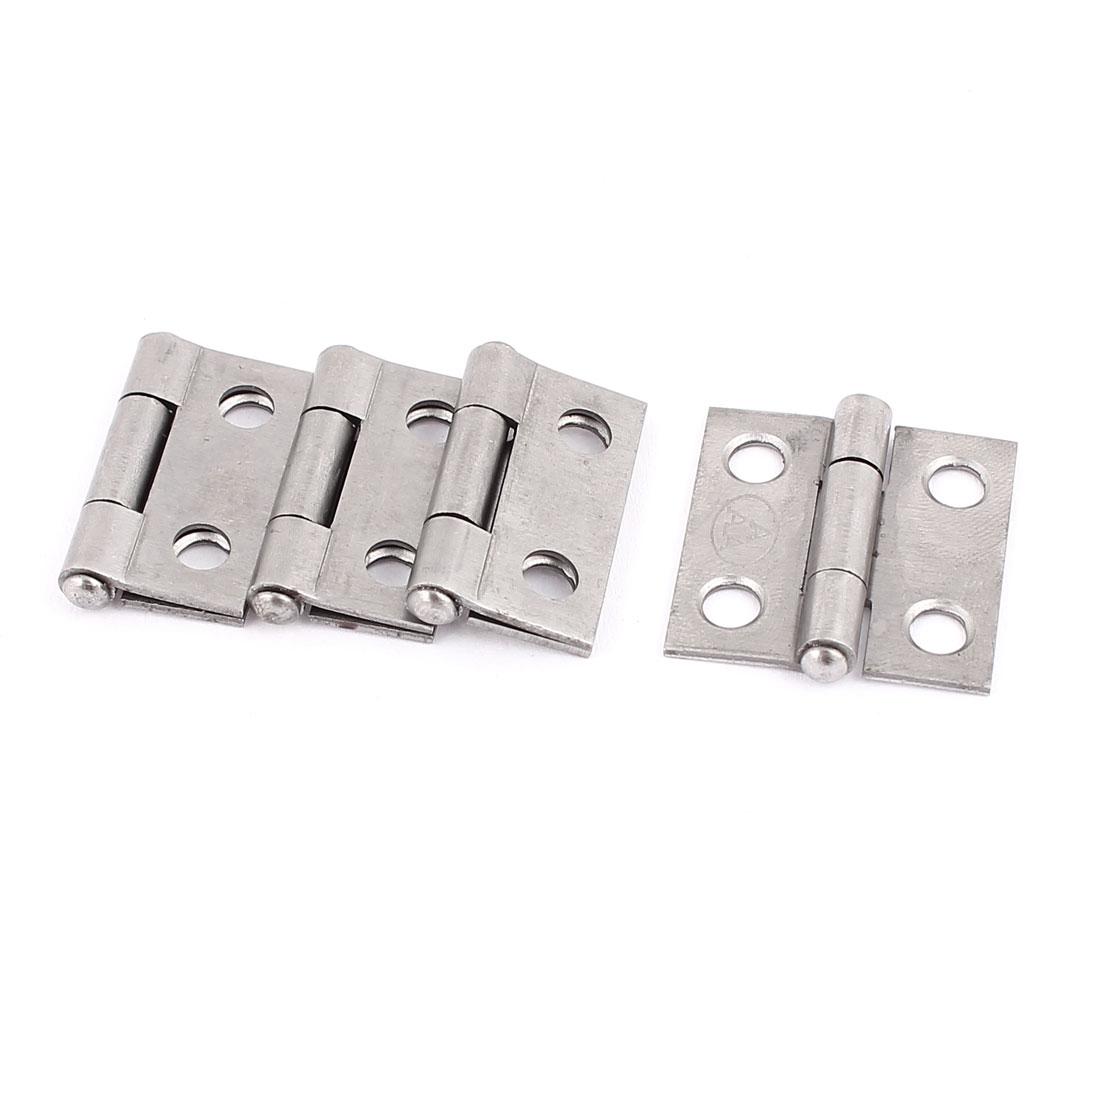 4 Pcs Gray Metal Rotatable Cabinet Door Butt Hinges 25mmx25mm